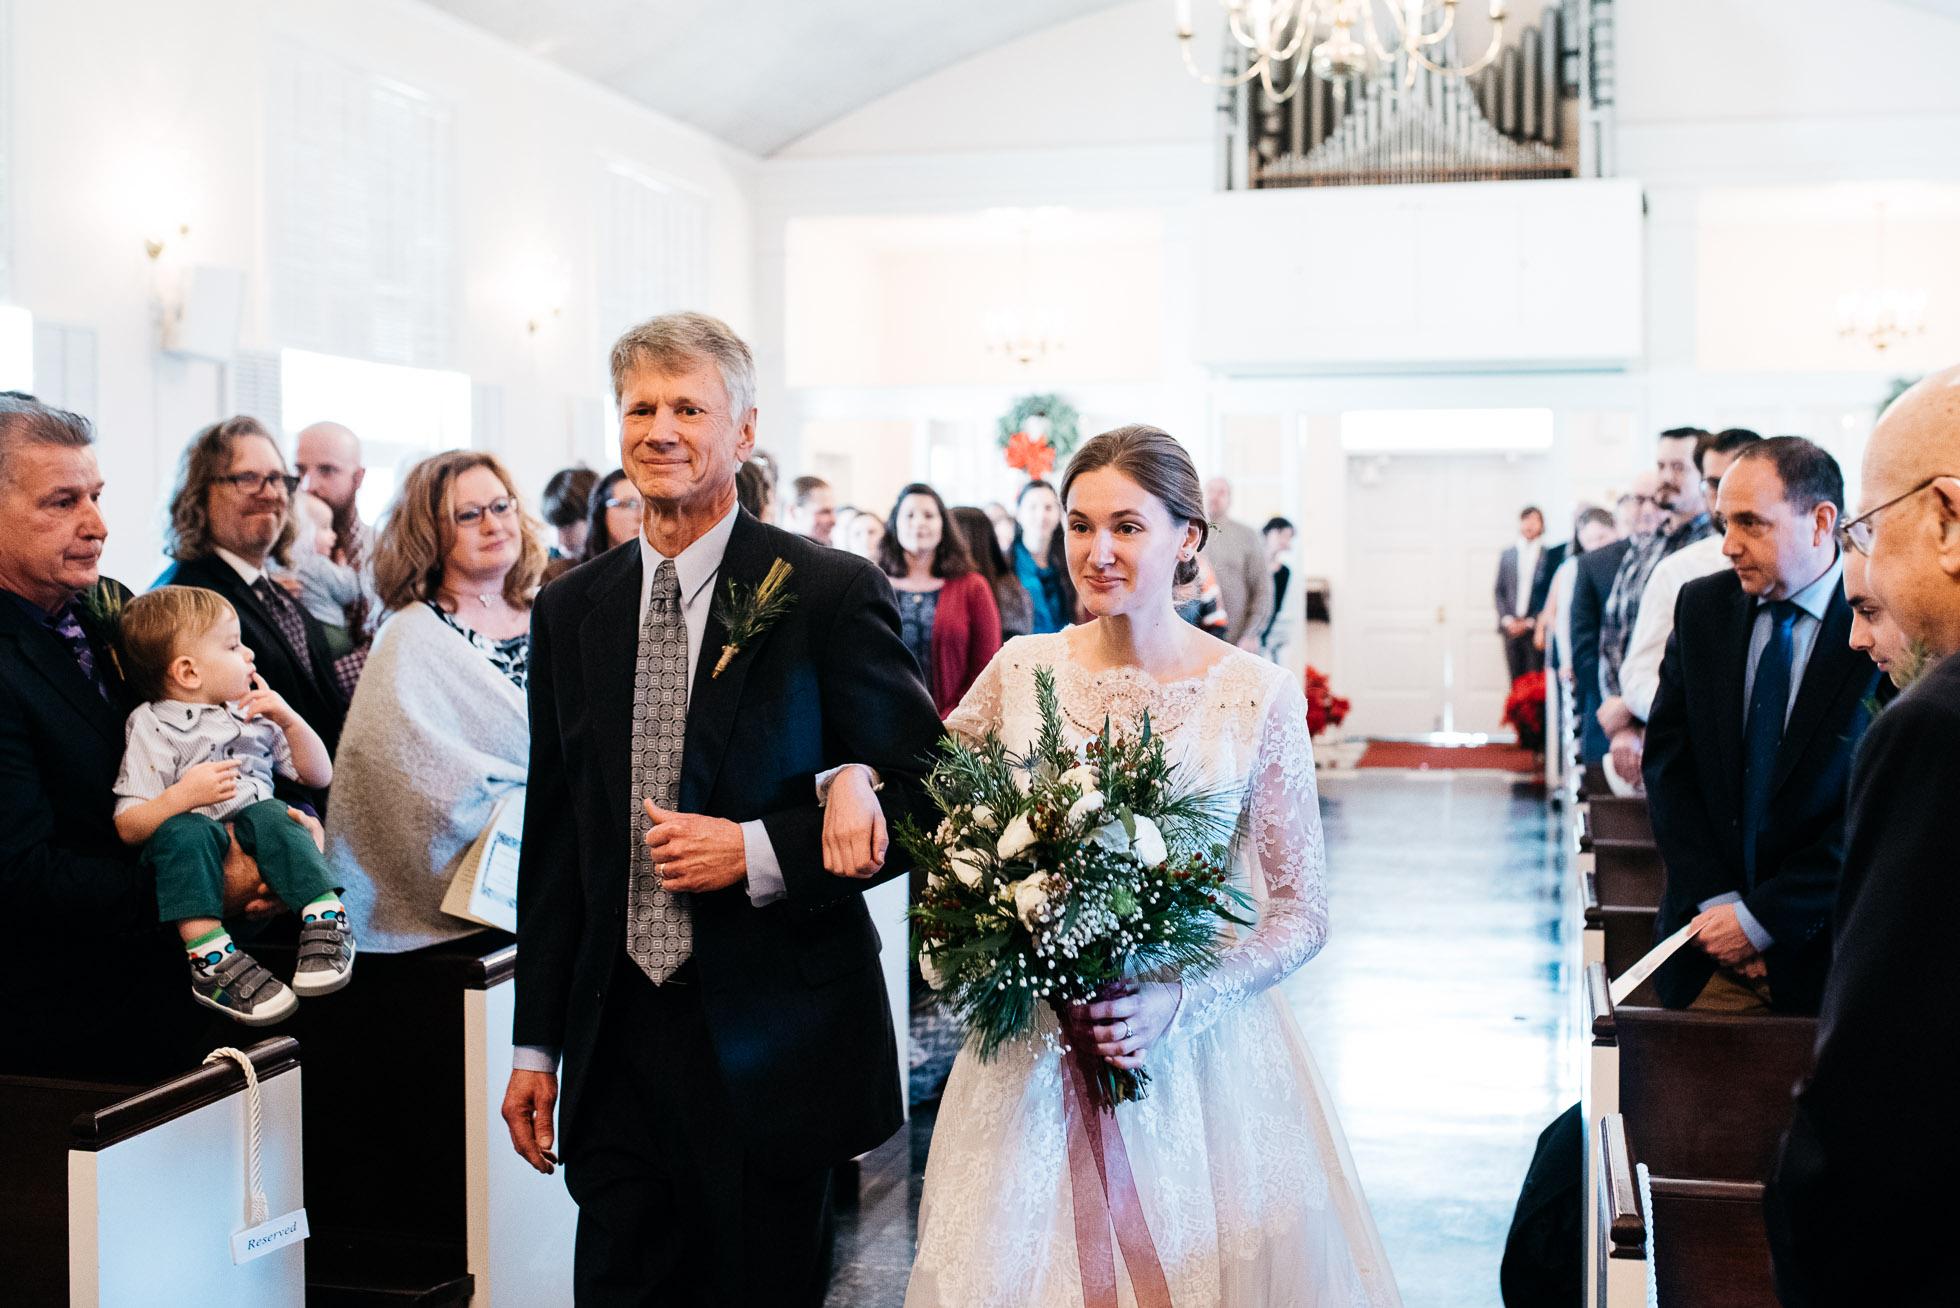 Ligonier PA wedding, wedding photography, Mariah Fisher Photography-6412.jpg